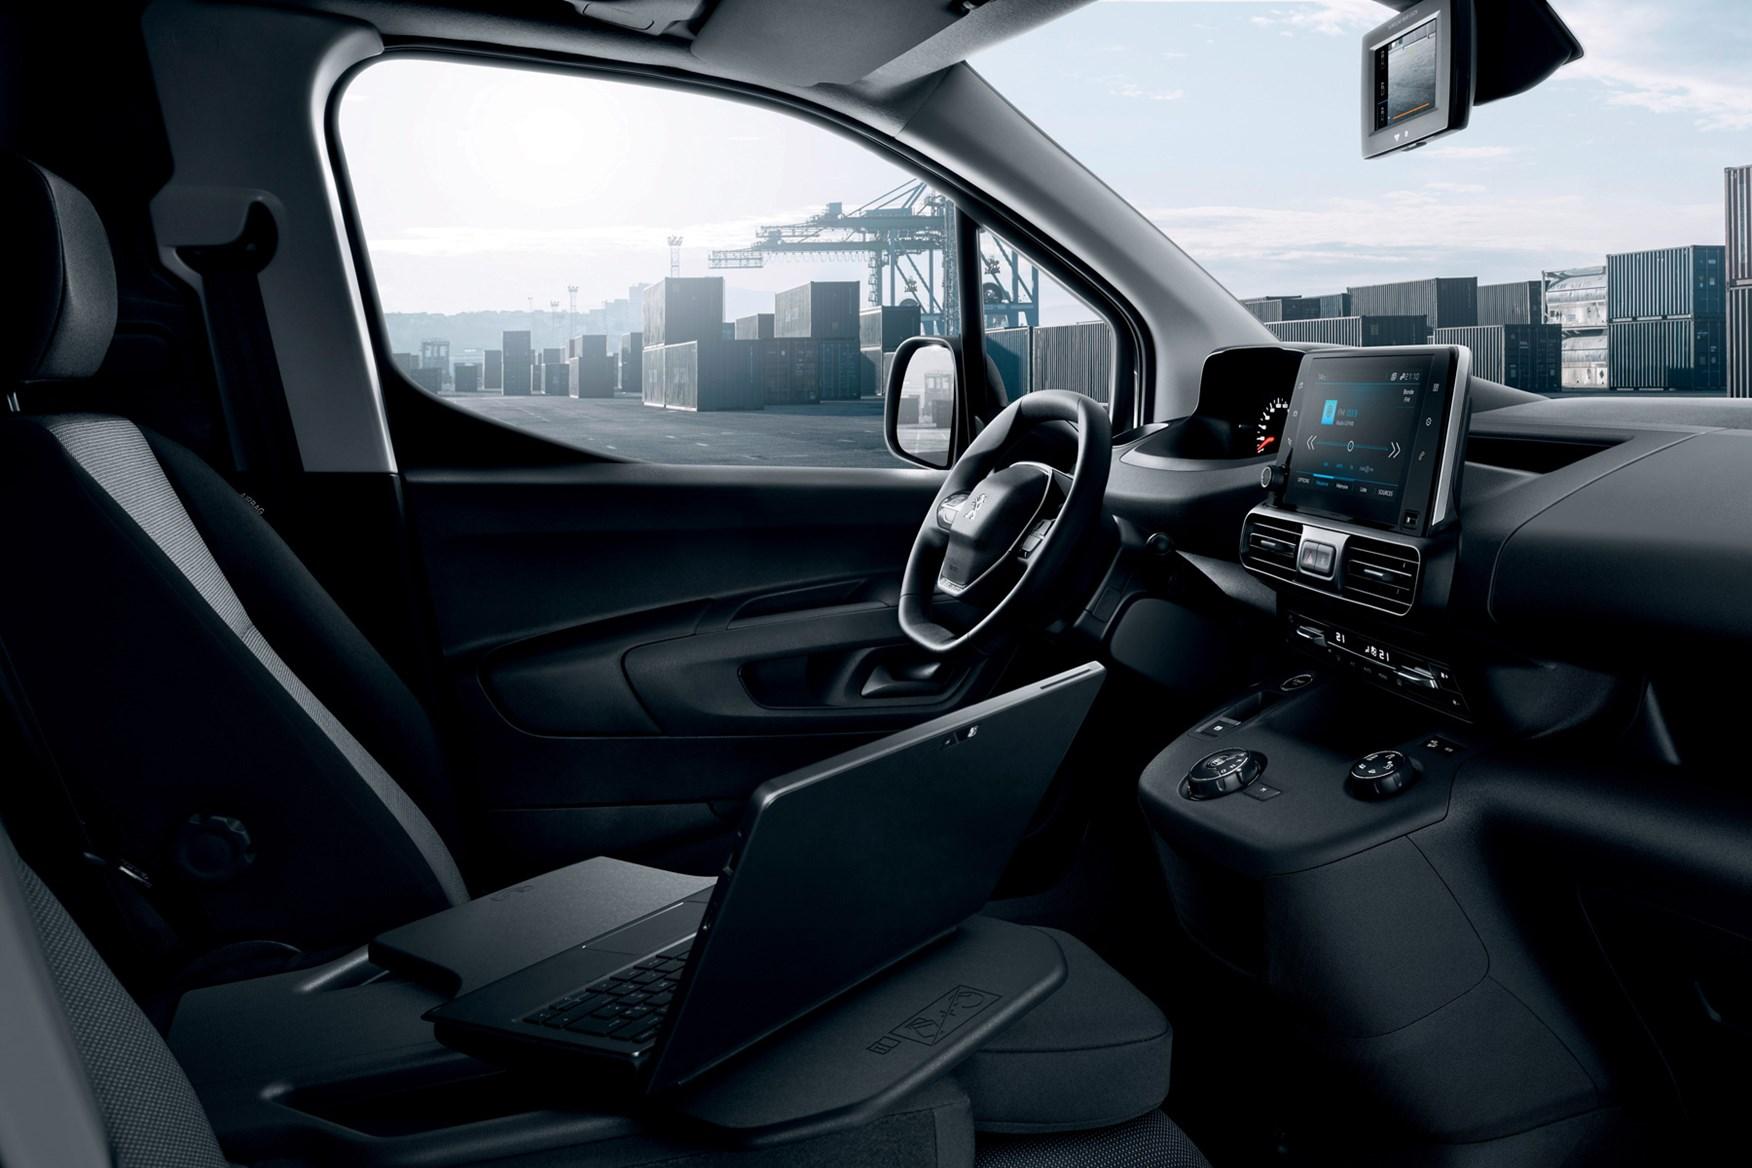 Peugeot Partner review 2020, i-Cockpit, view from passenger side